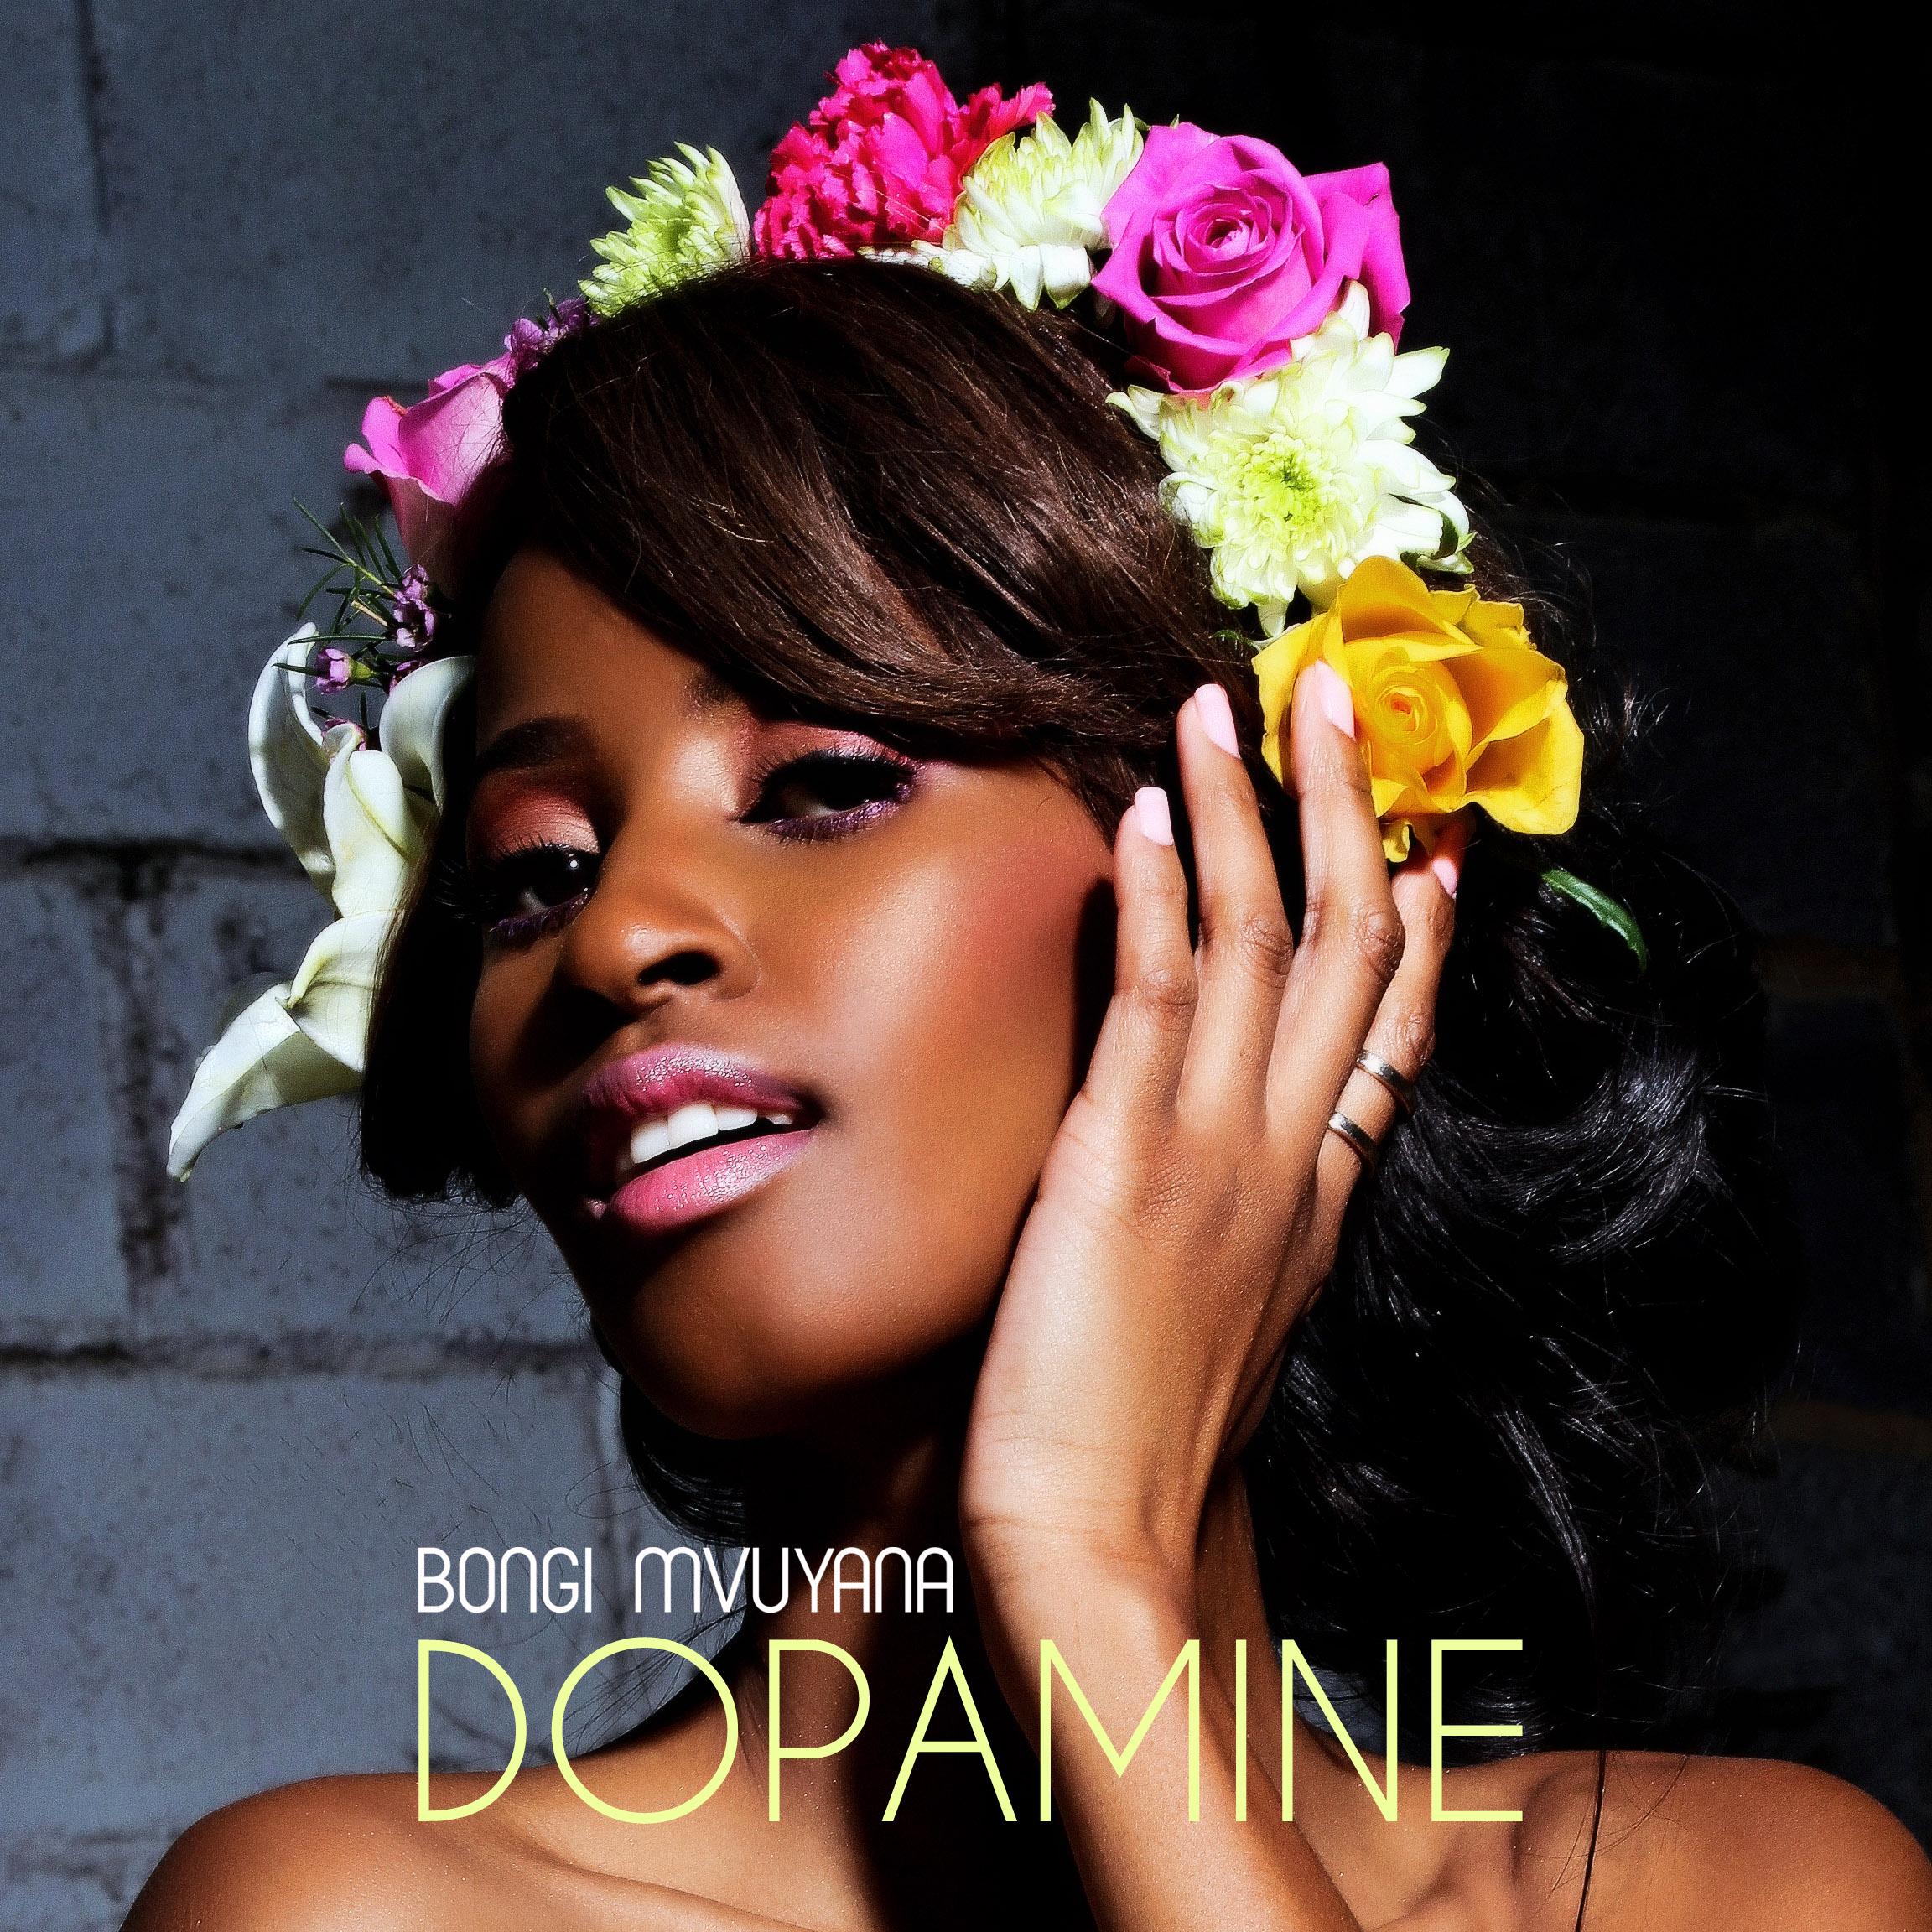 Bongi Mvuyana - Dopamine - Album Cover